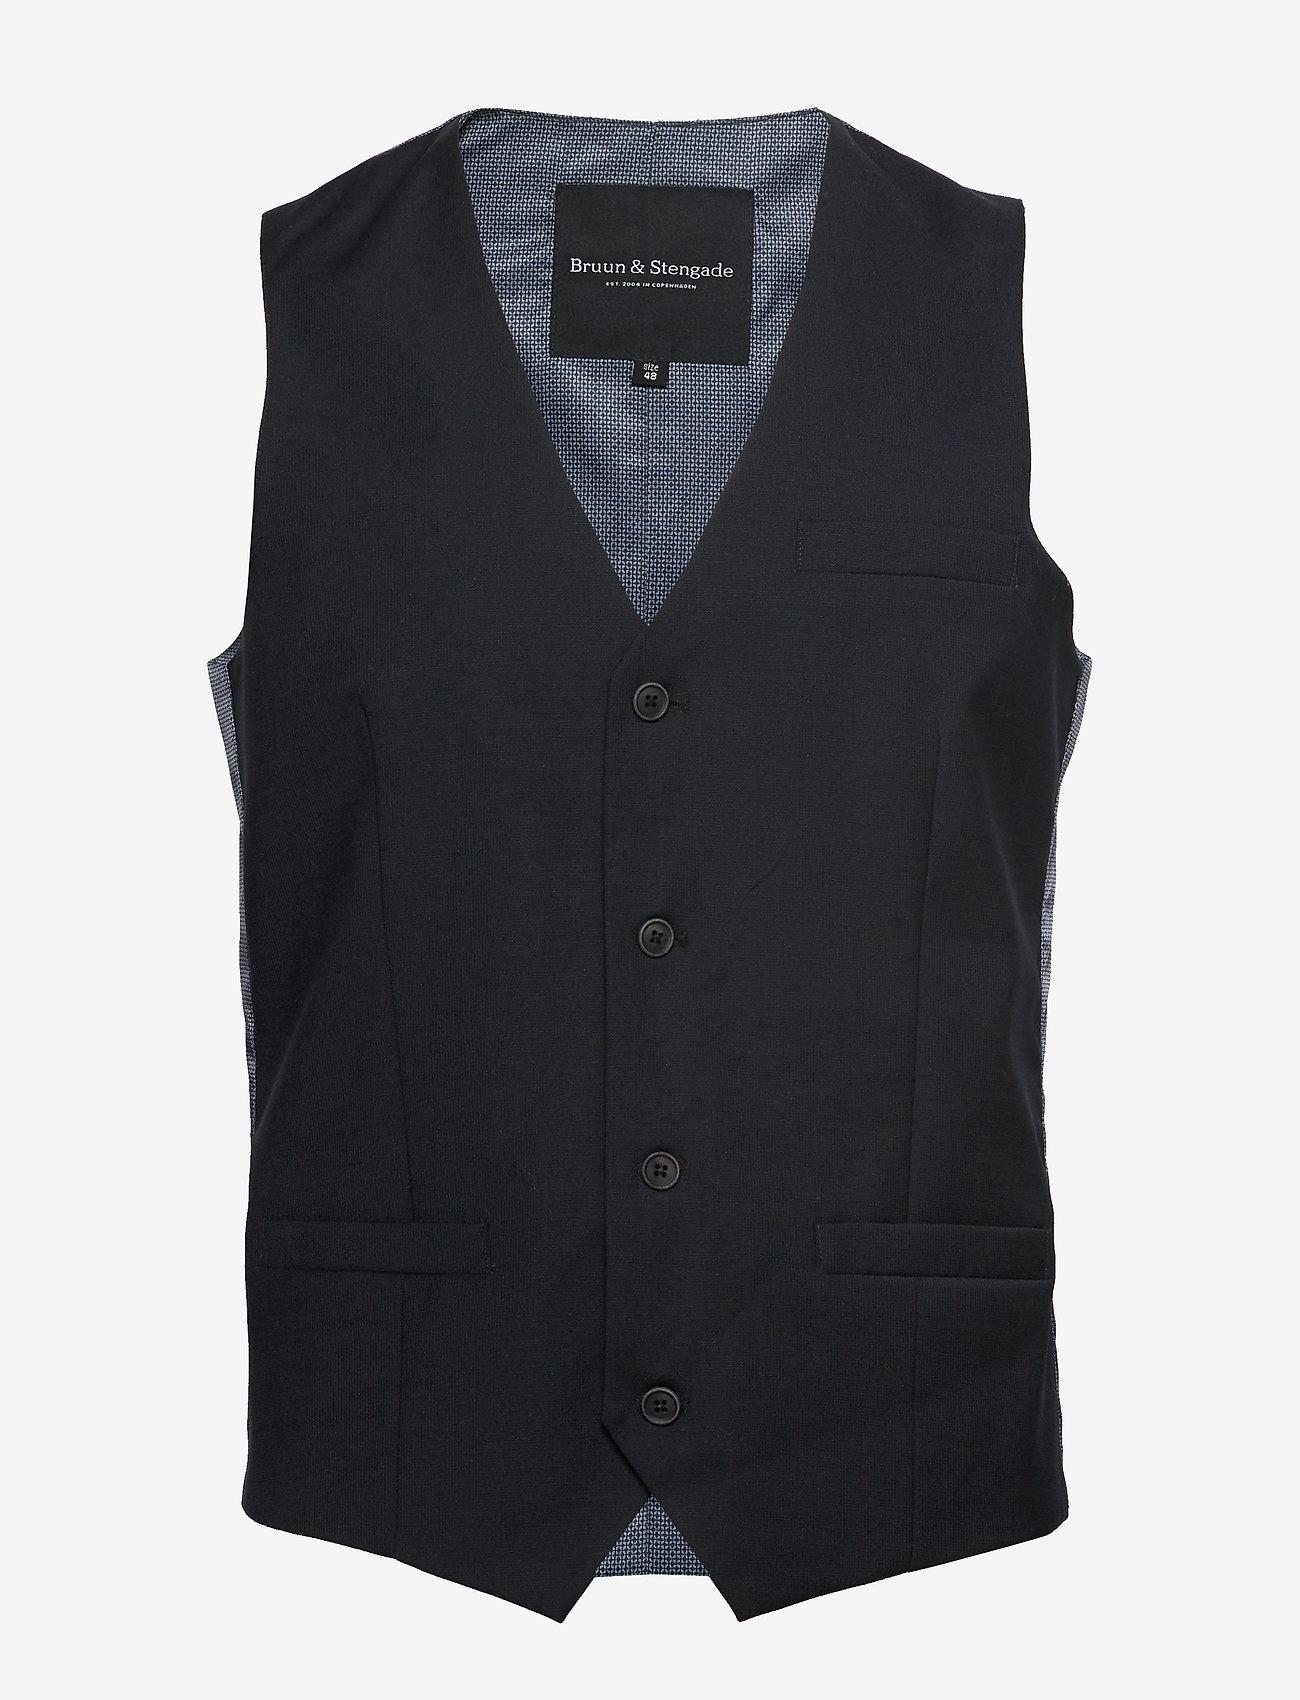 Bruun & Stengade - BS Hardmann - waistcoats - black - 0